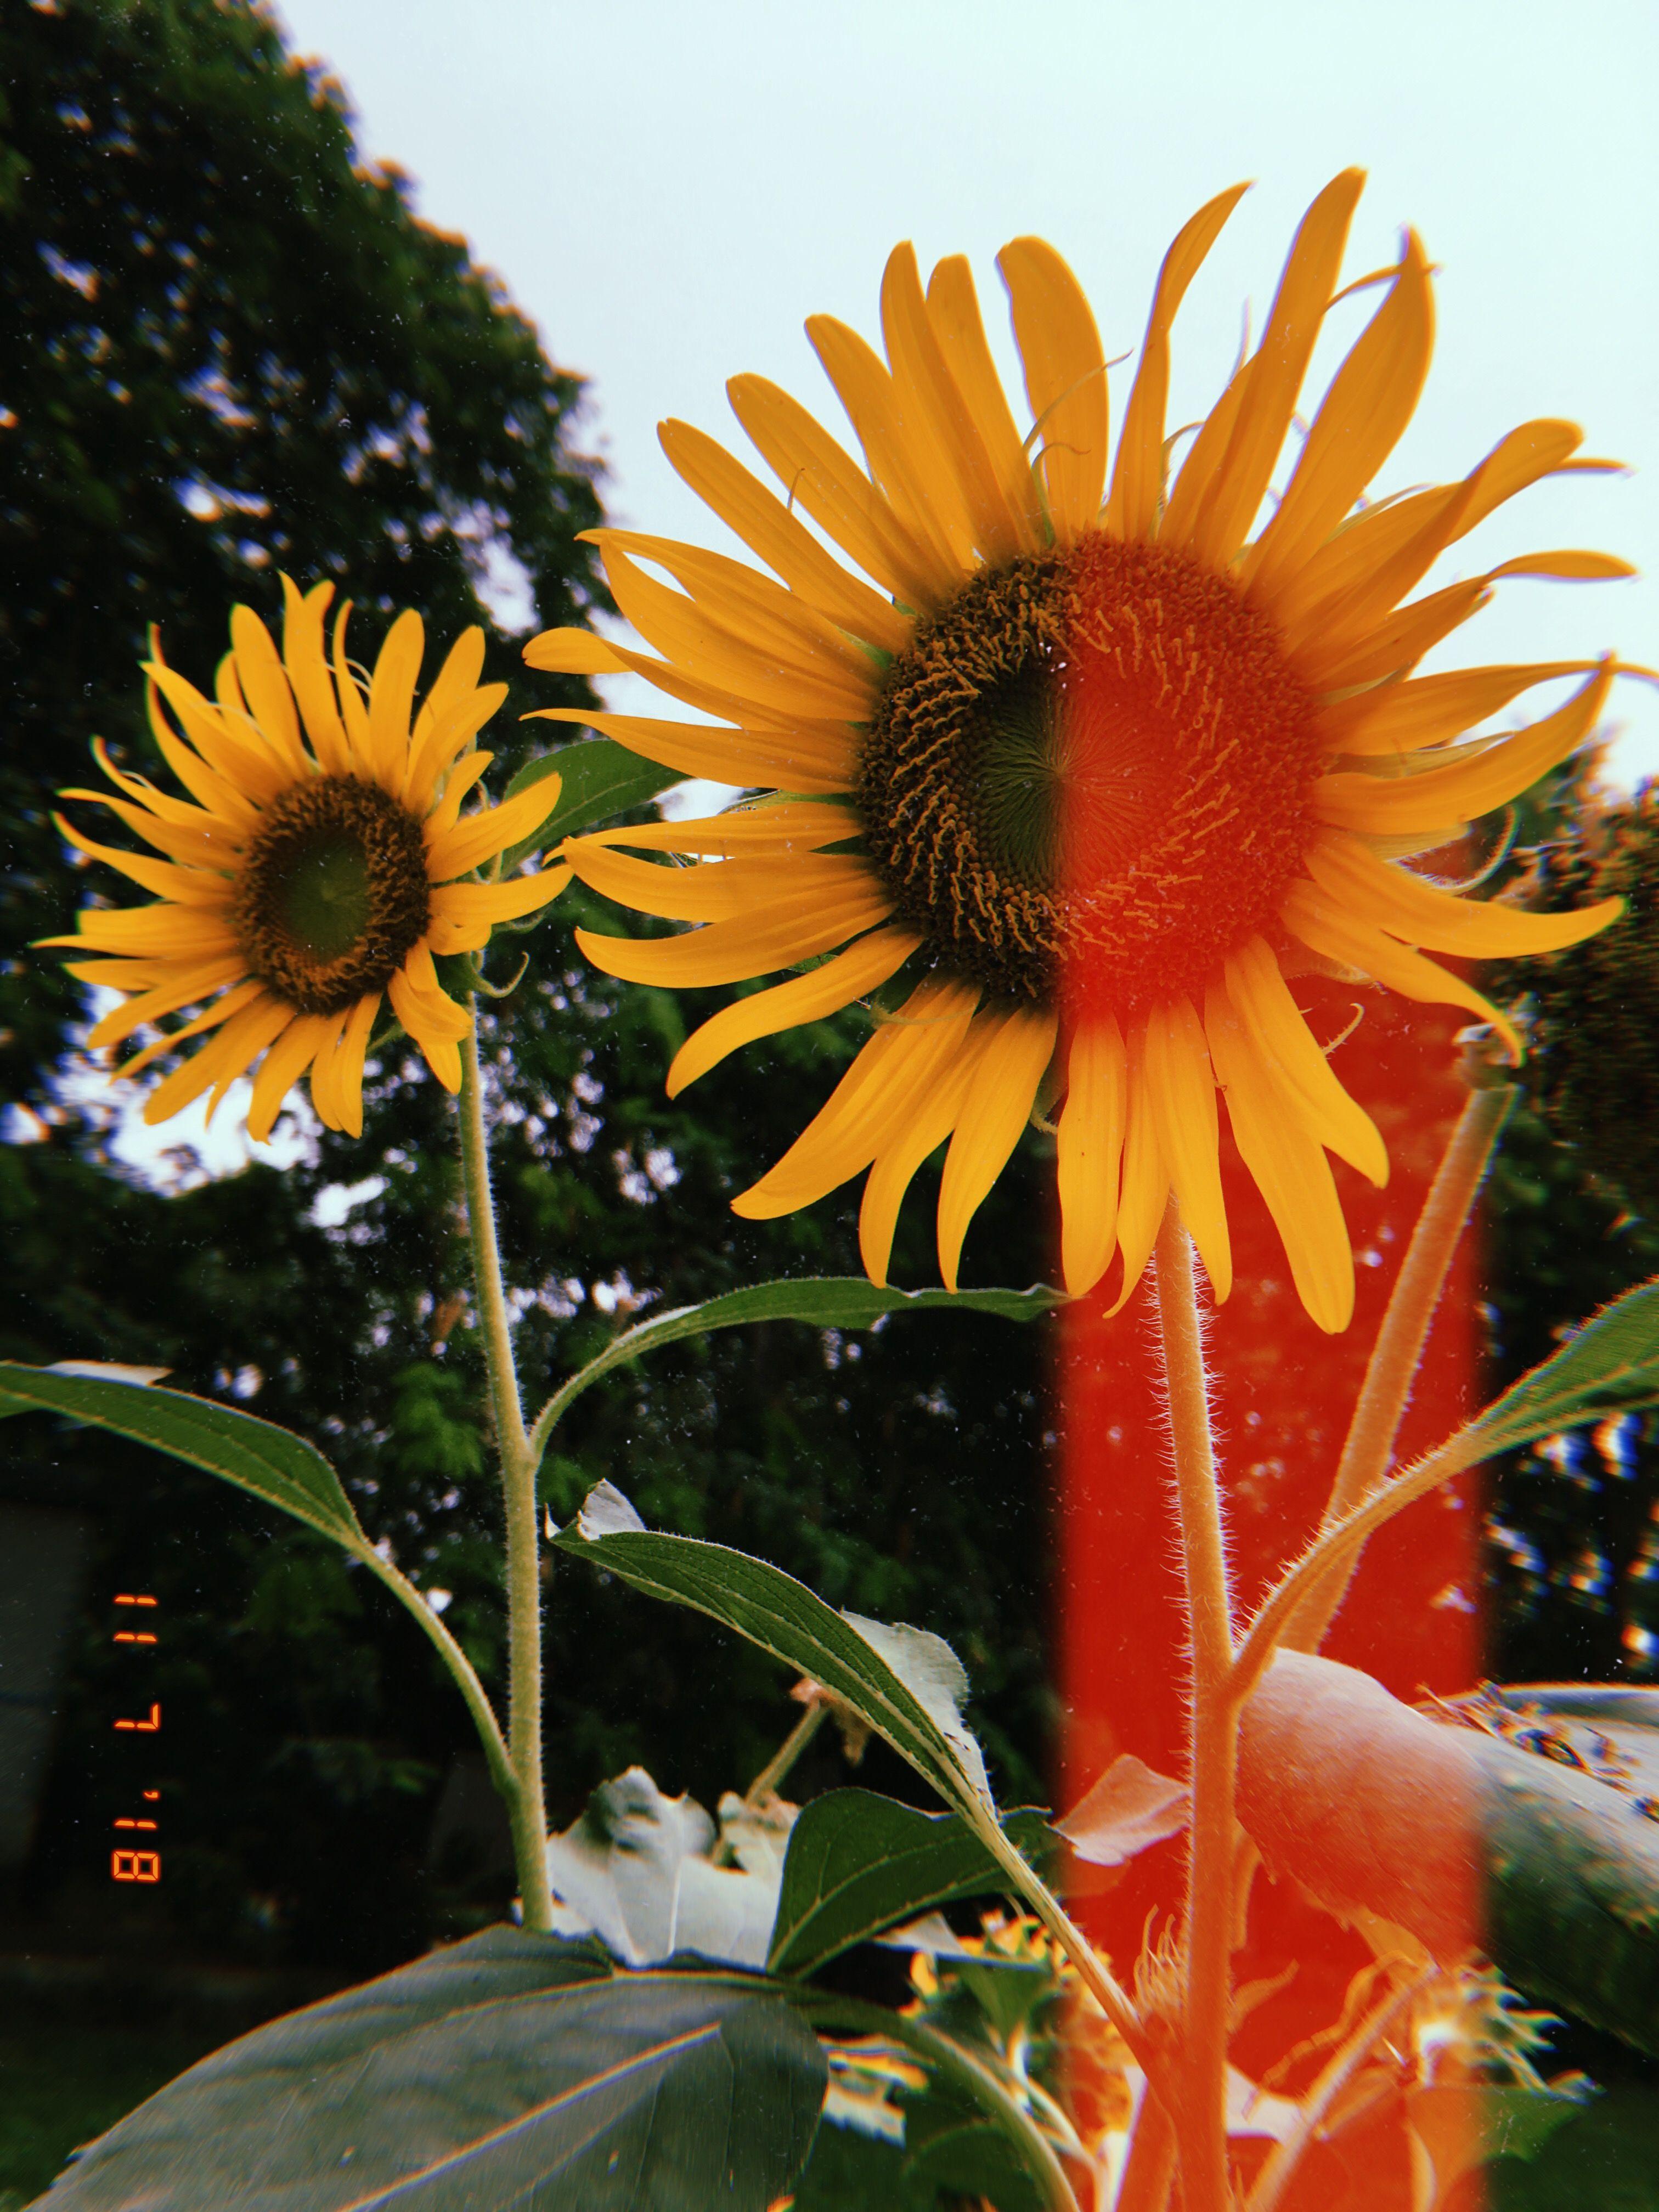 Huji Cam Photo Tumblr Flower Floral Photography Sunflower Wallpaper